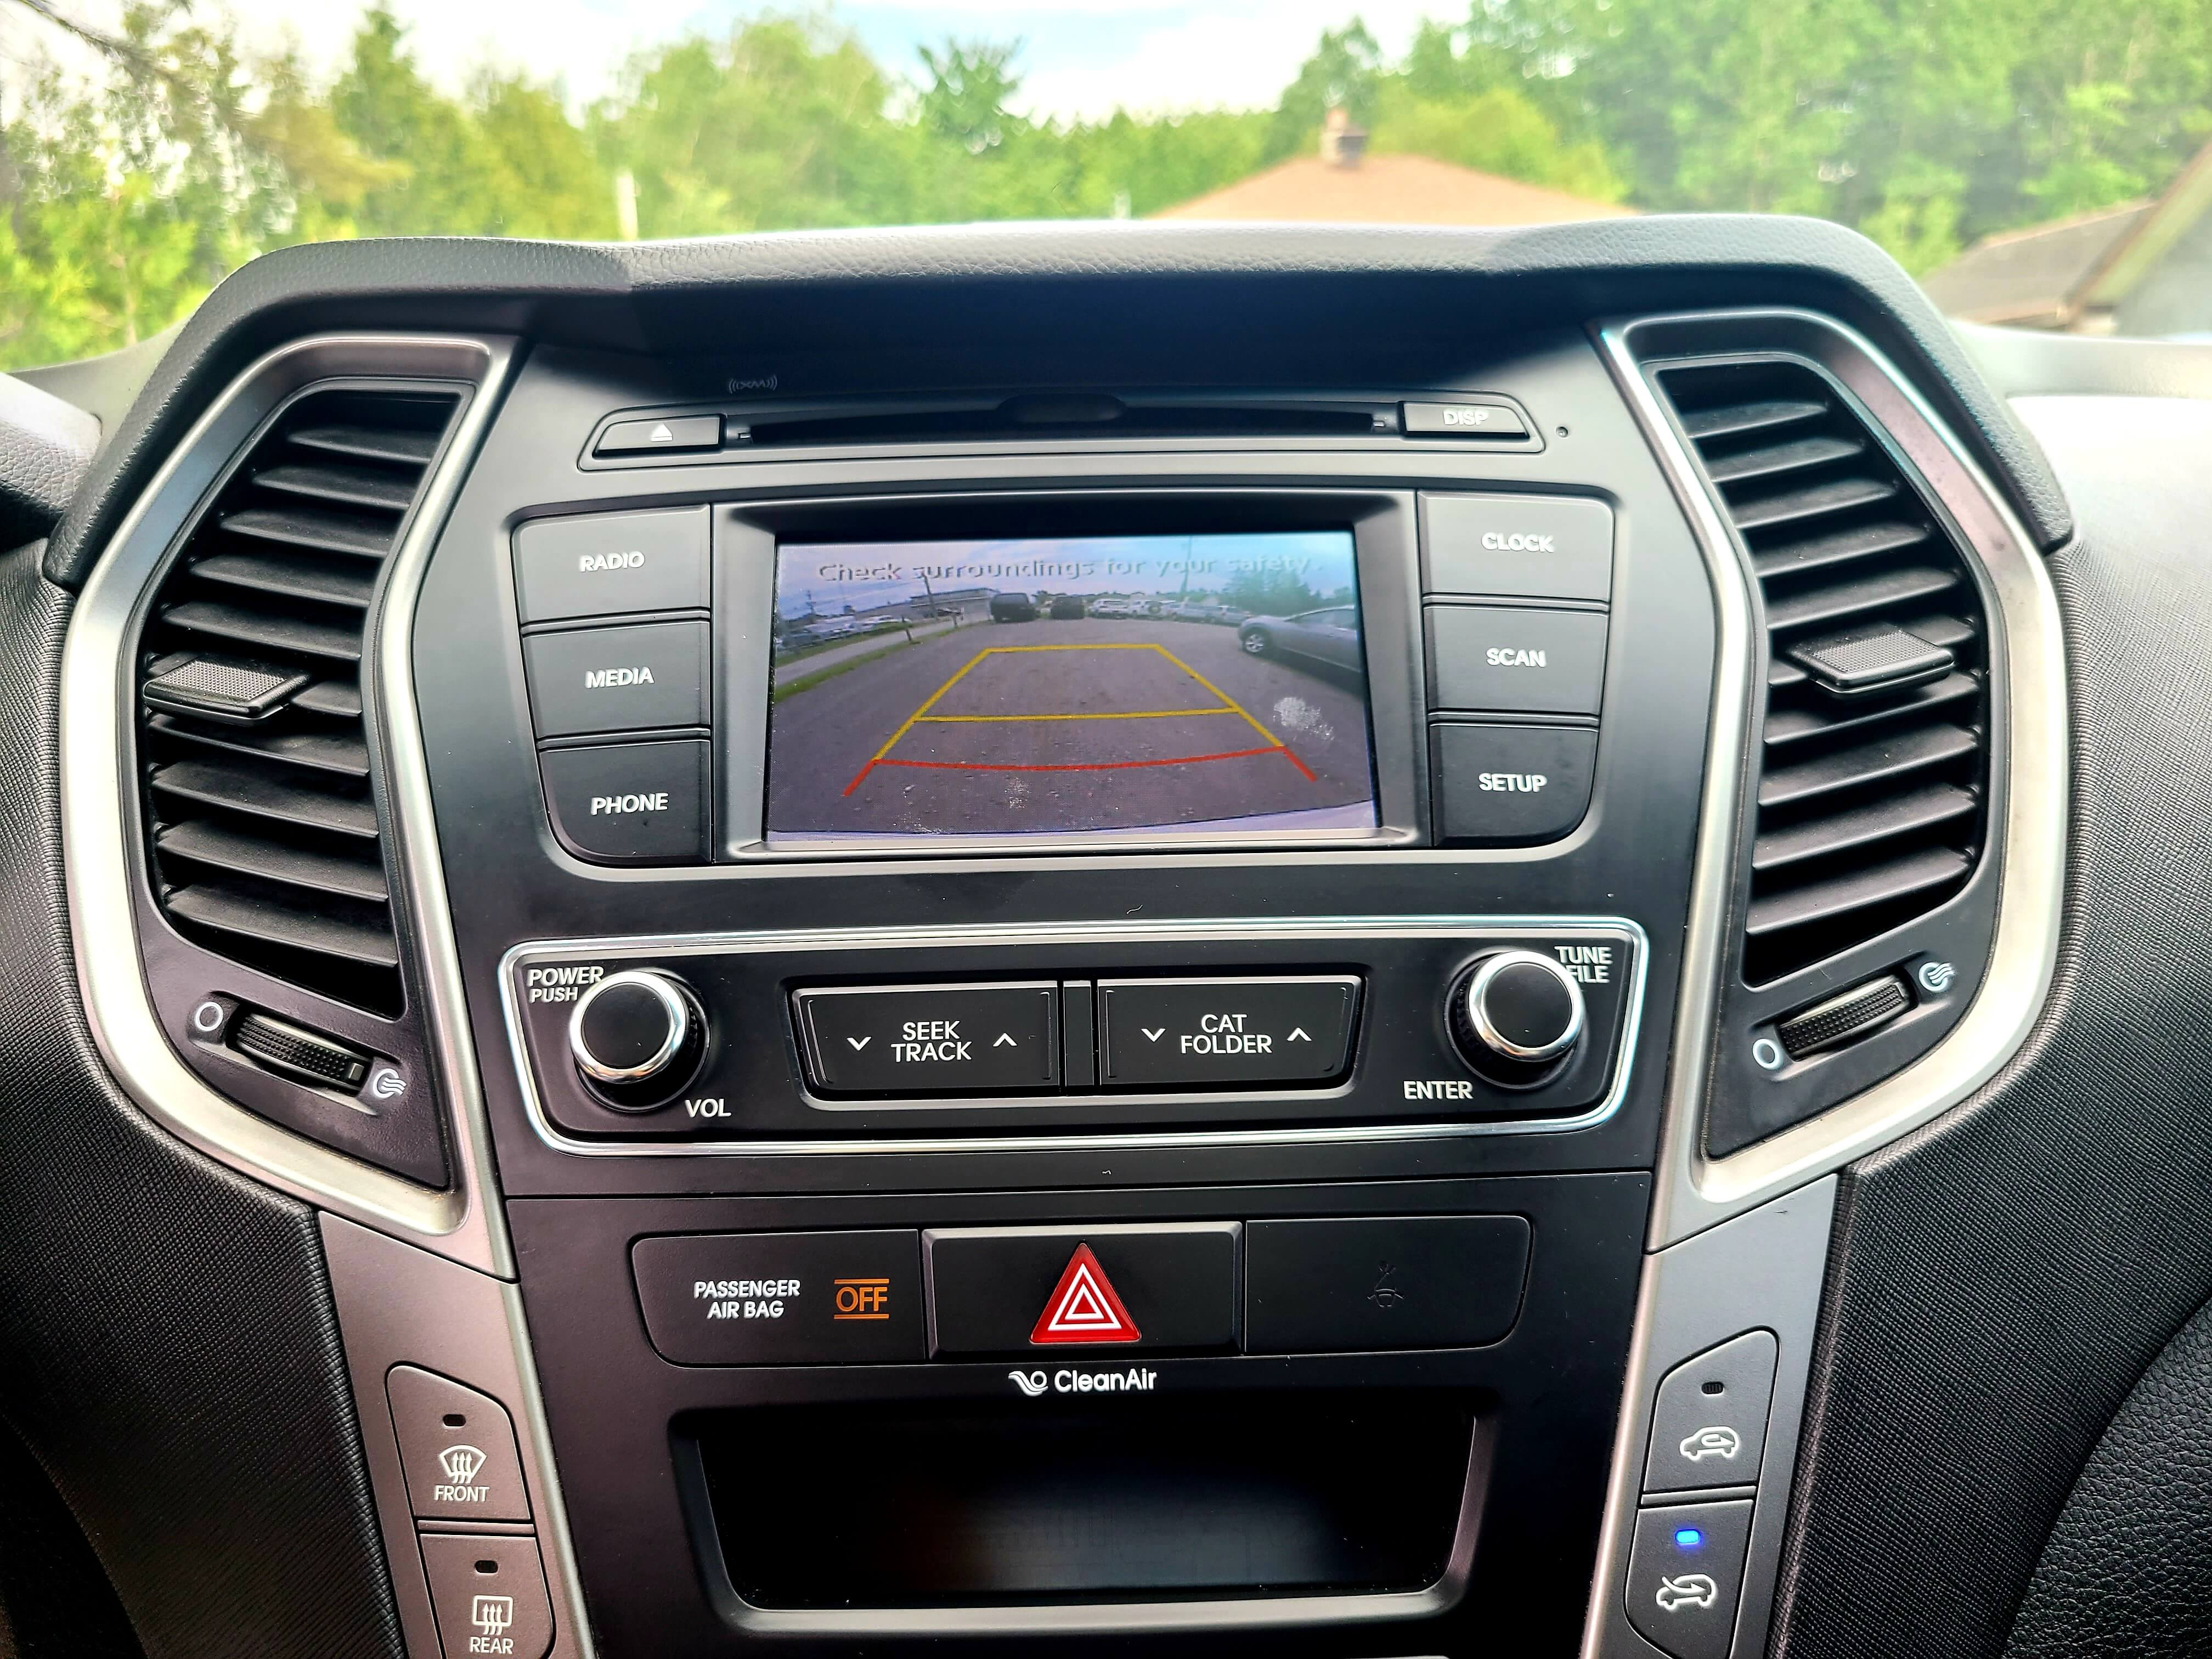 2017 Hyundai Santa Fe AWD /CUIR/ CAMERA/ PANO complet